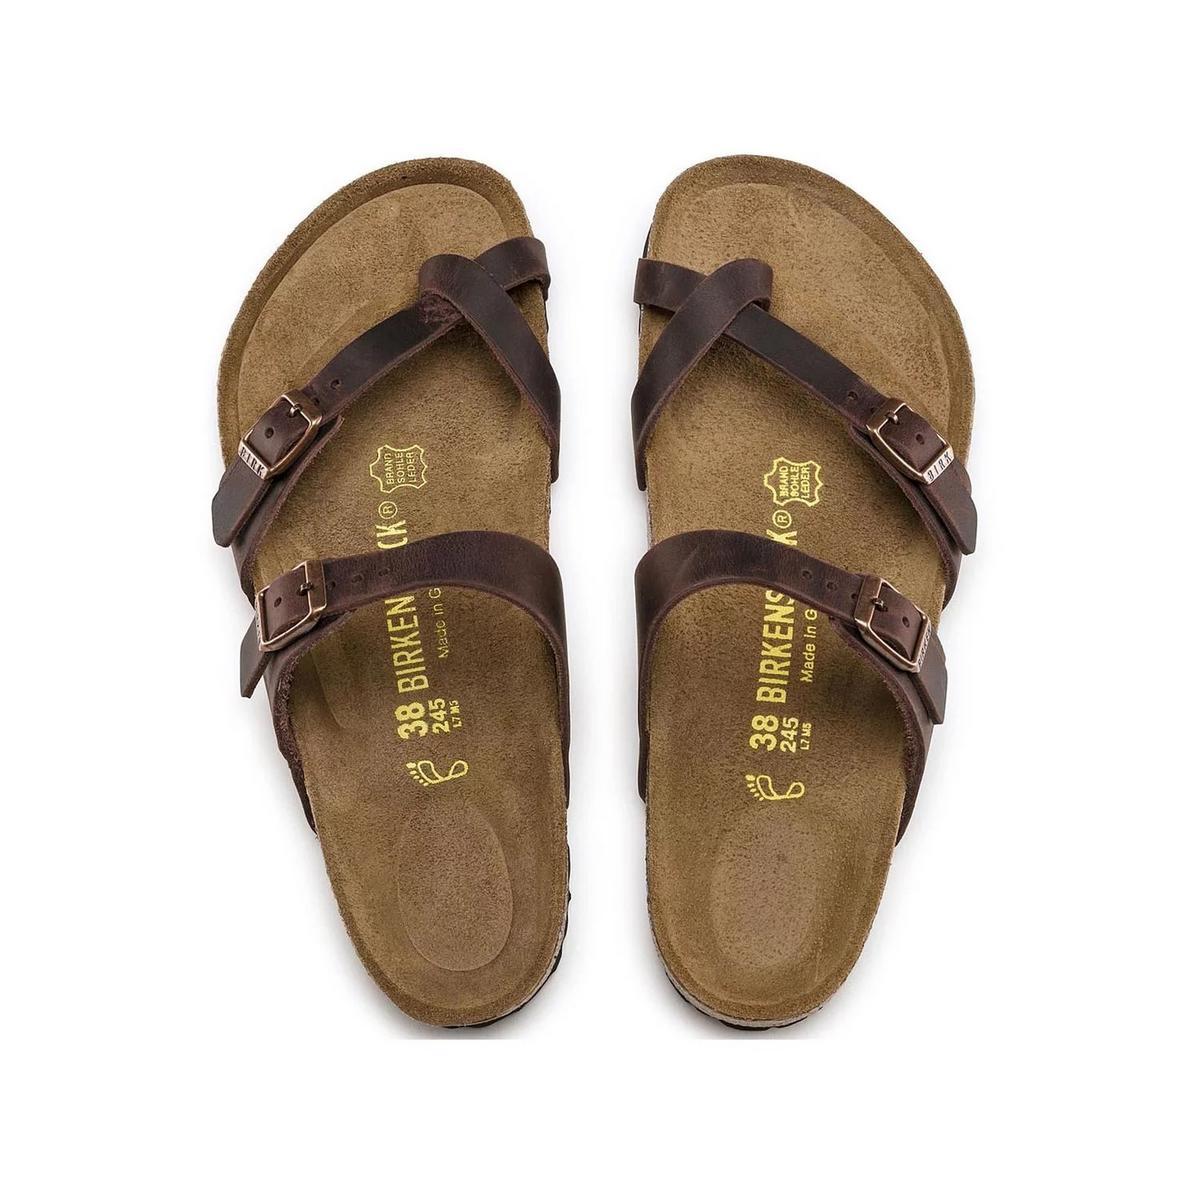 Birkenstock Women's Mayari Thong Oiled Leather Sandal